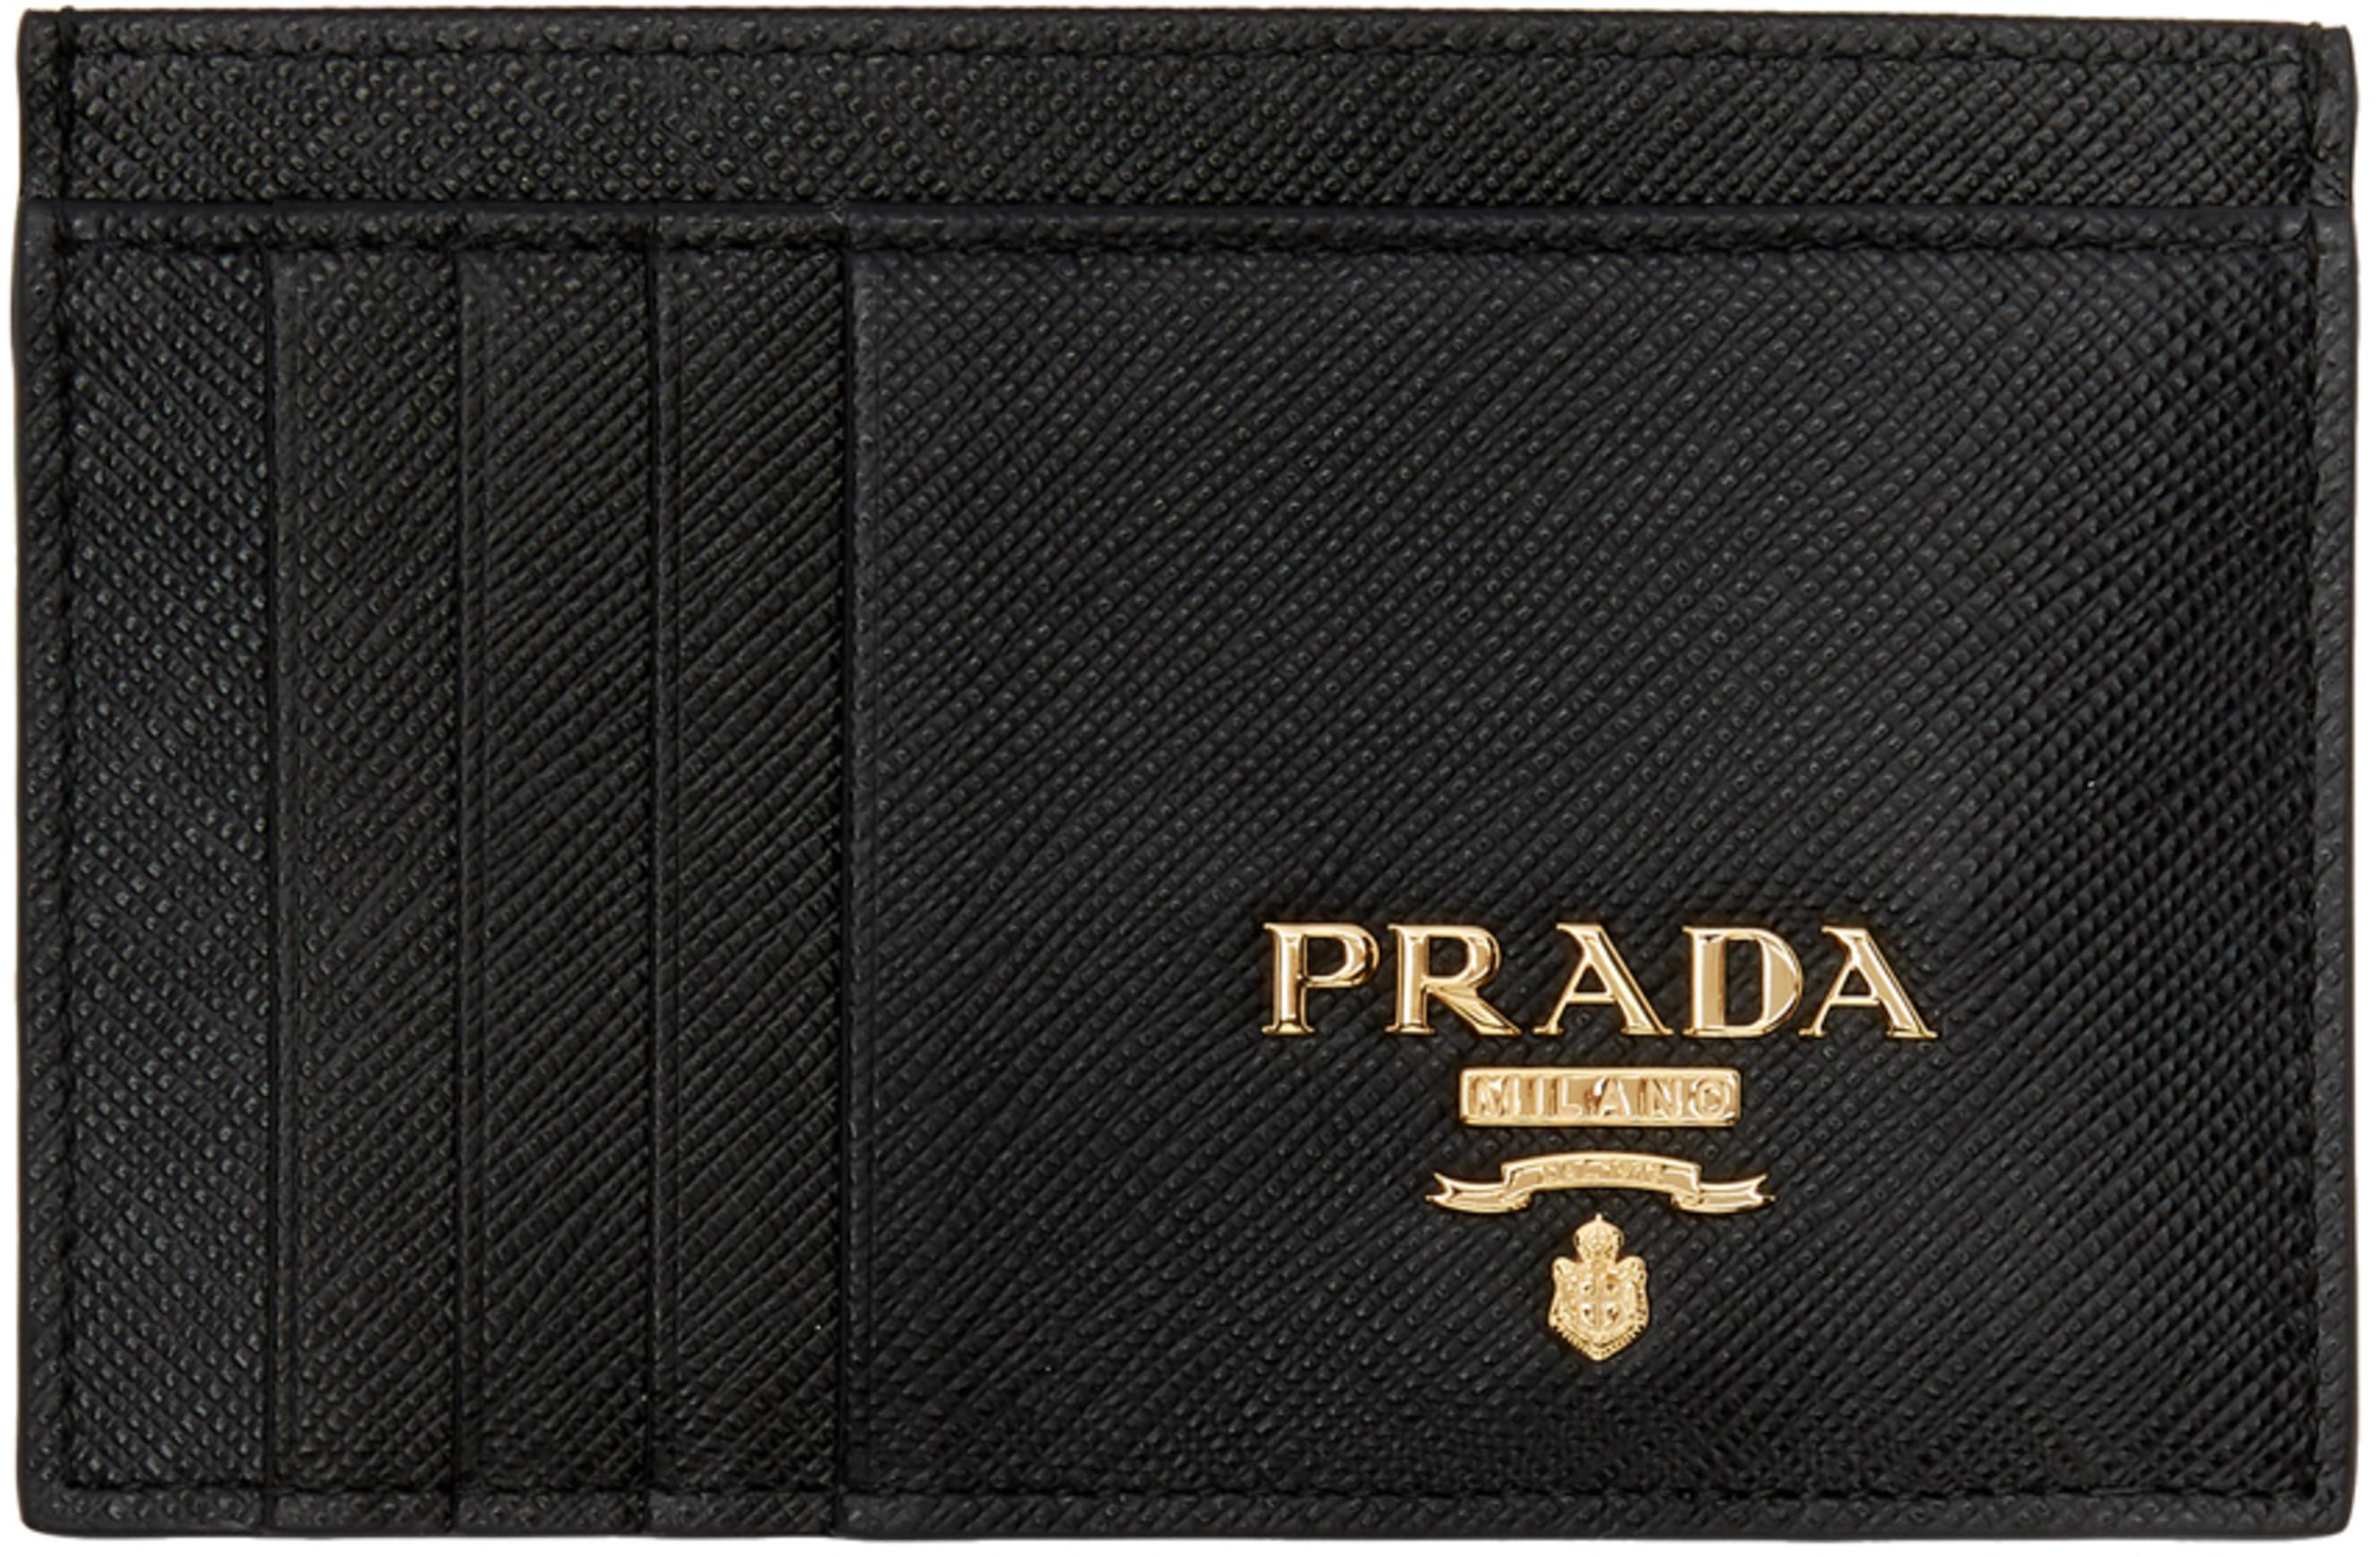 3e779c8020c1 Prada for Women SS19 Collection | SSENSE Canada